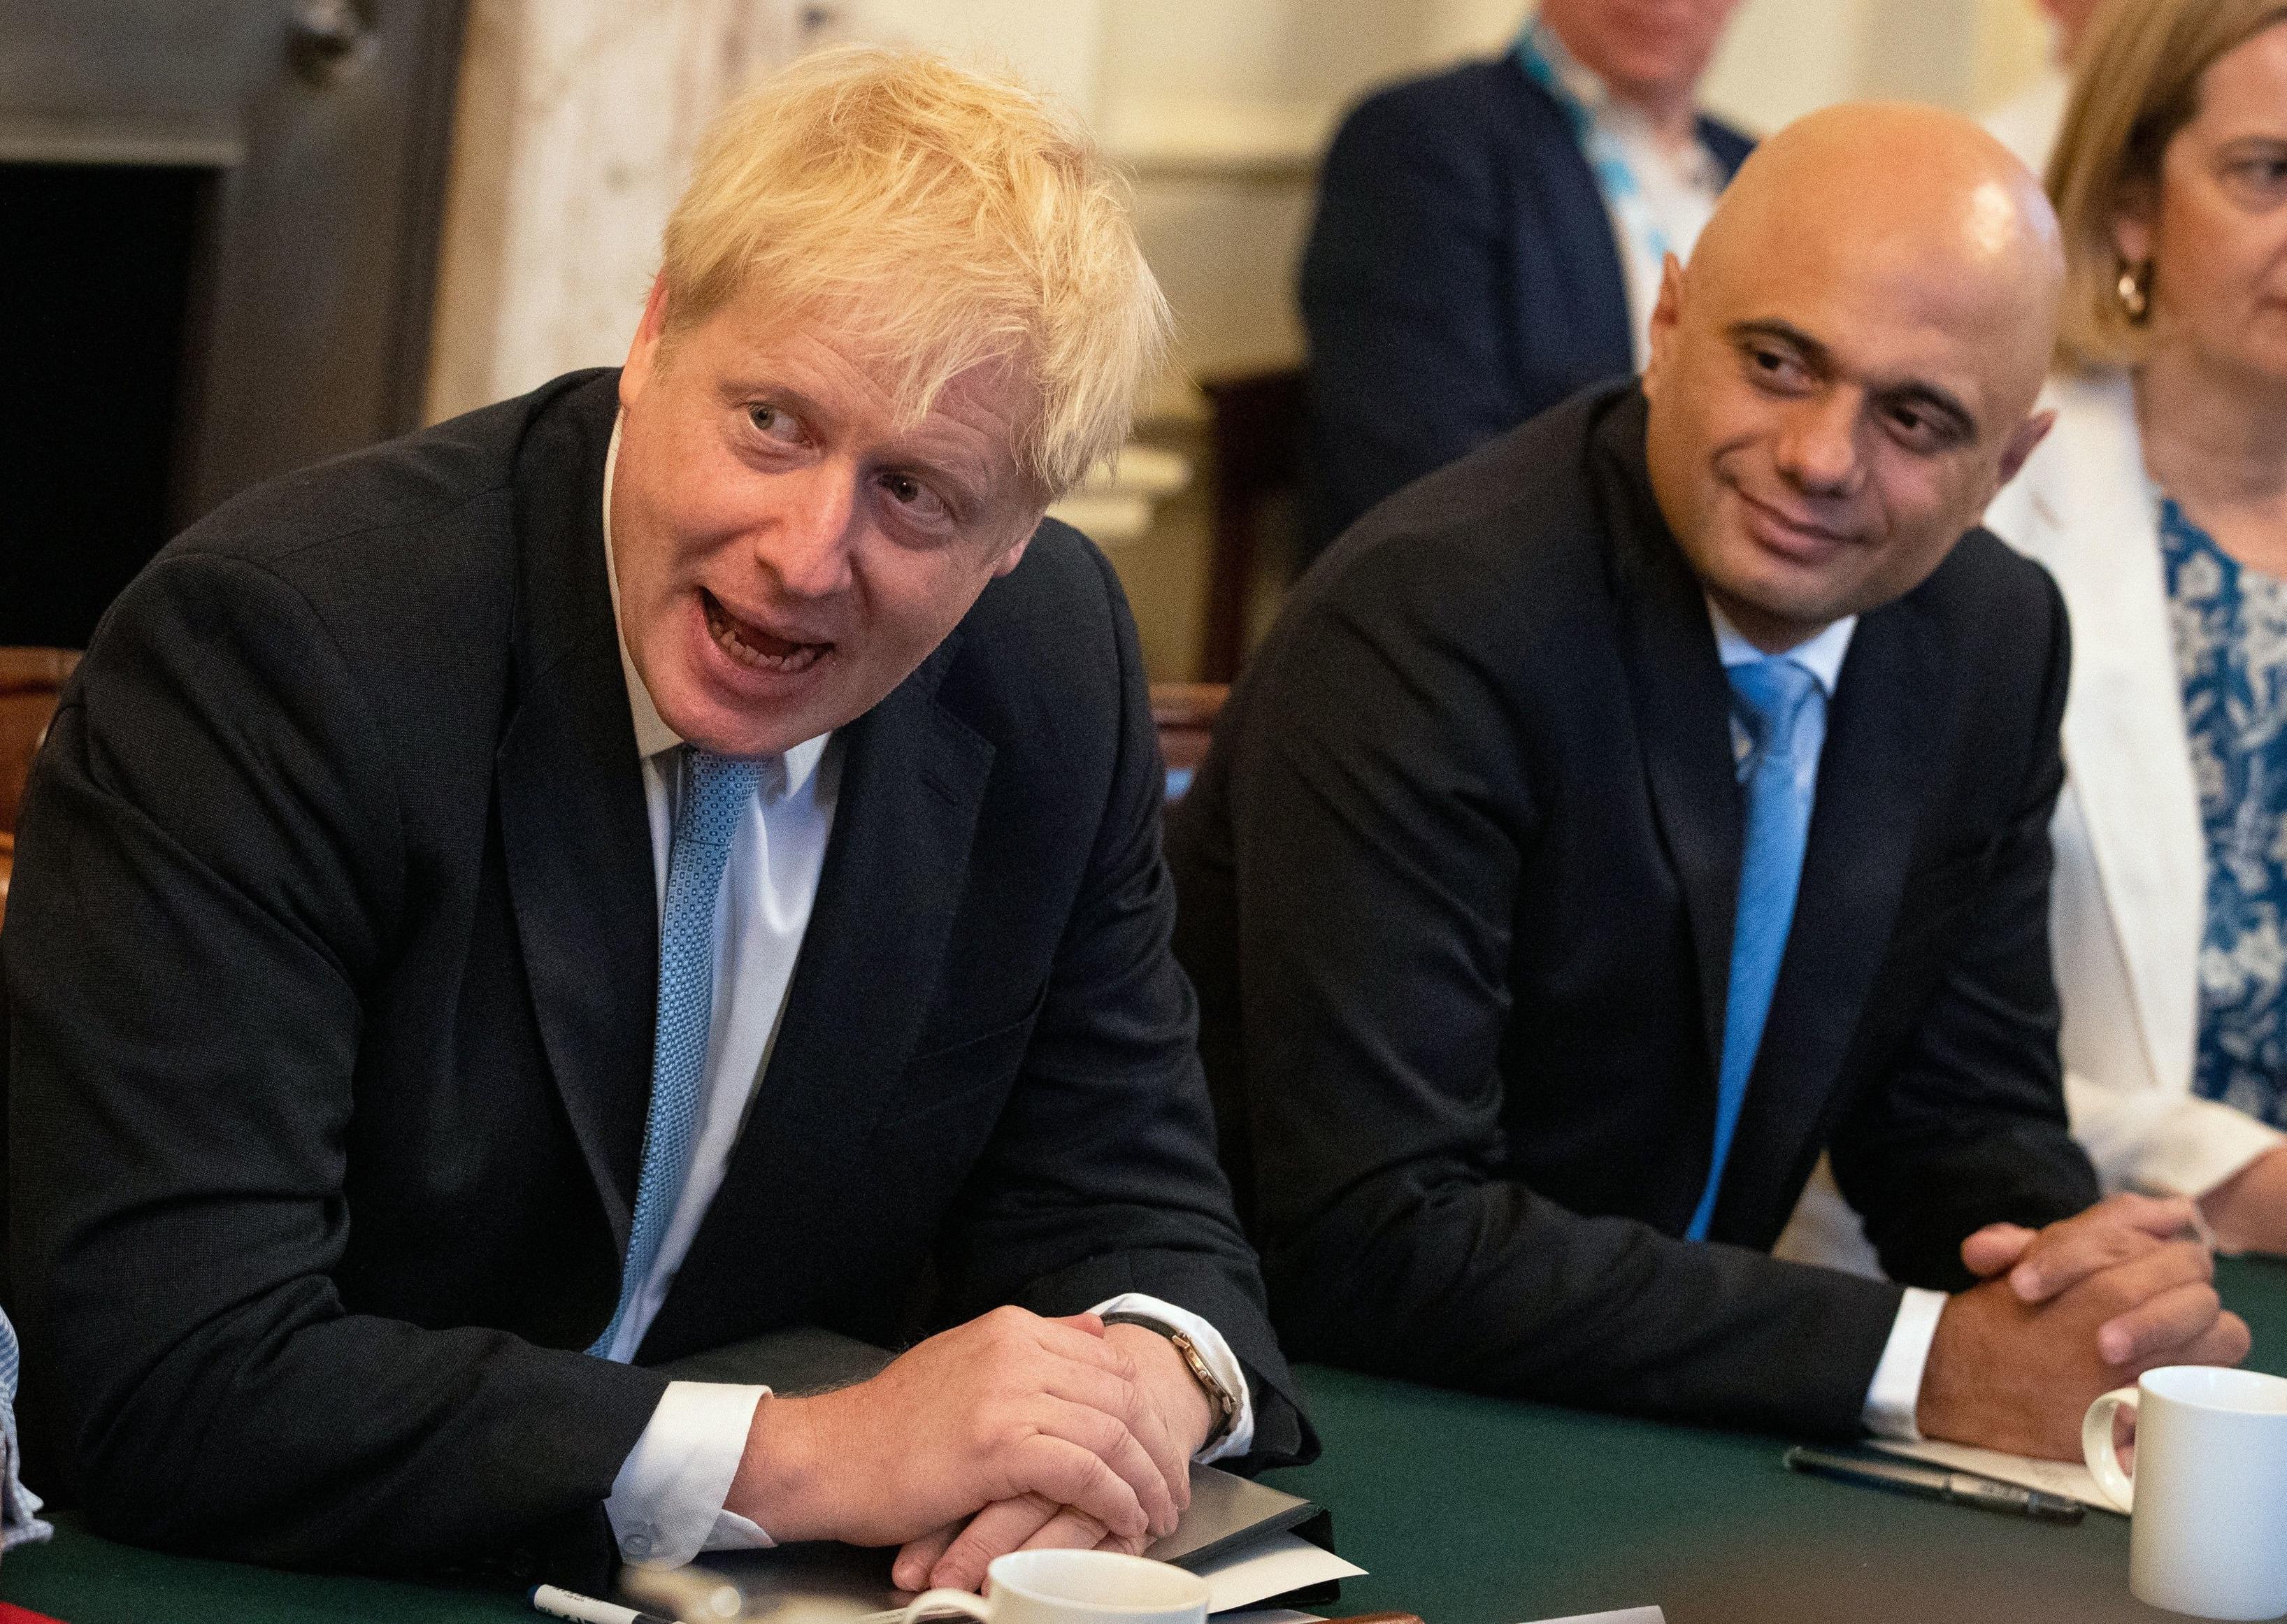 Boris Johnson poses a deeply disturbing threat to BBC, judges and civil service – Ian Swanson